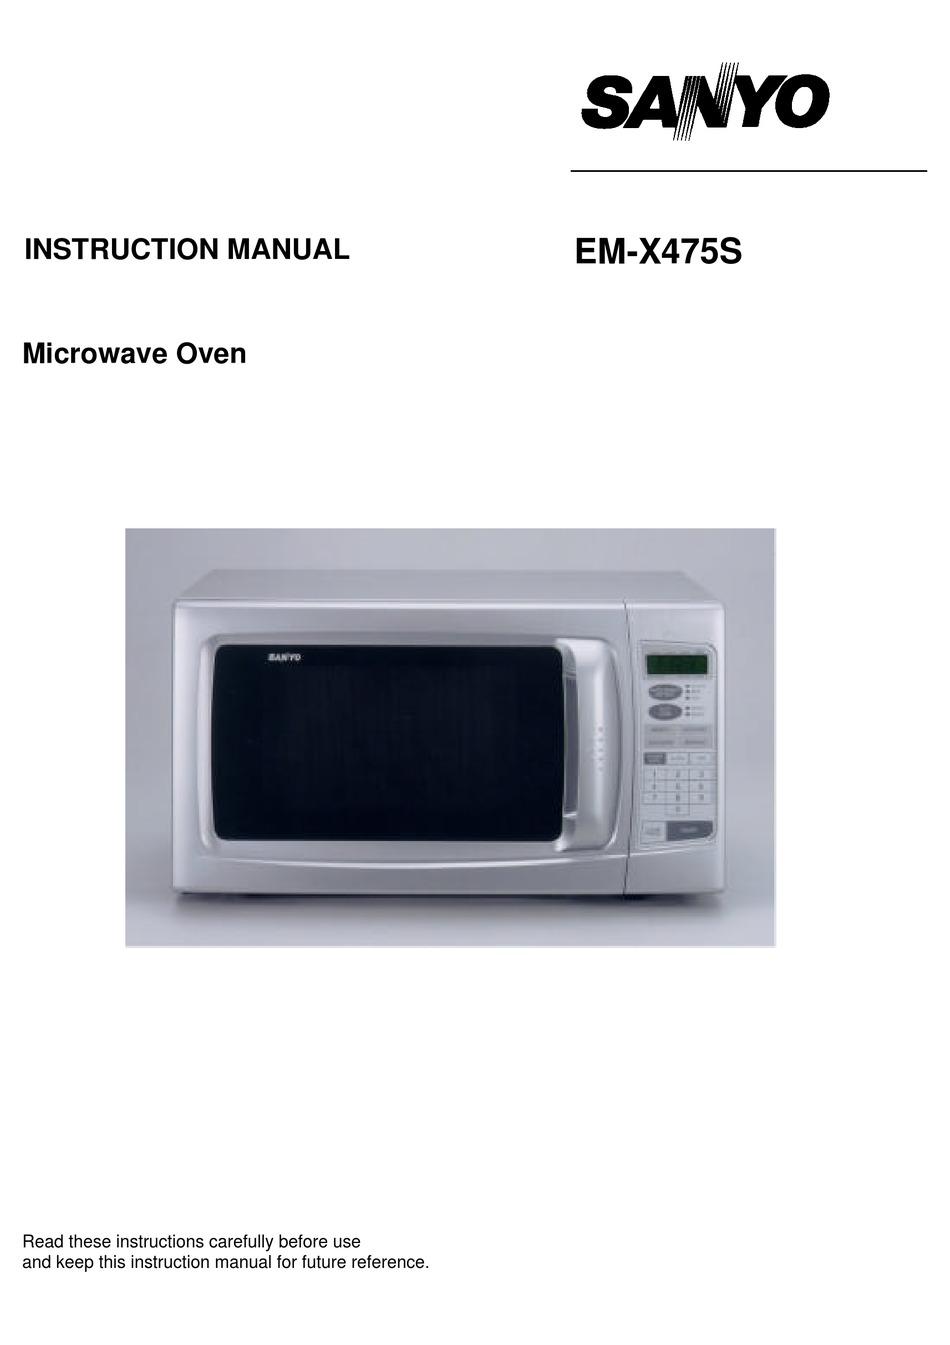 Sanyo Em X475s Instruction Manual Pdf